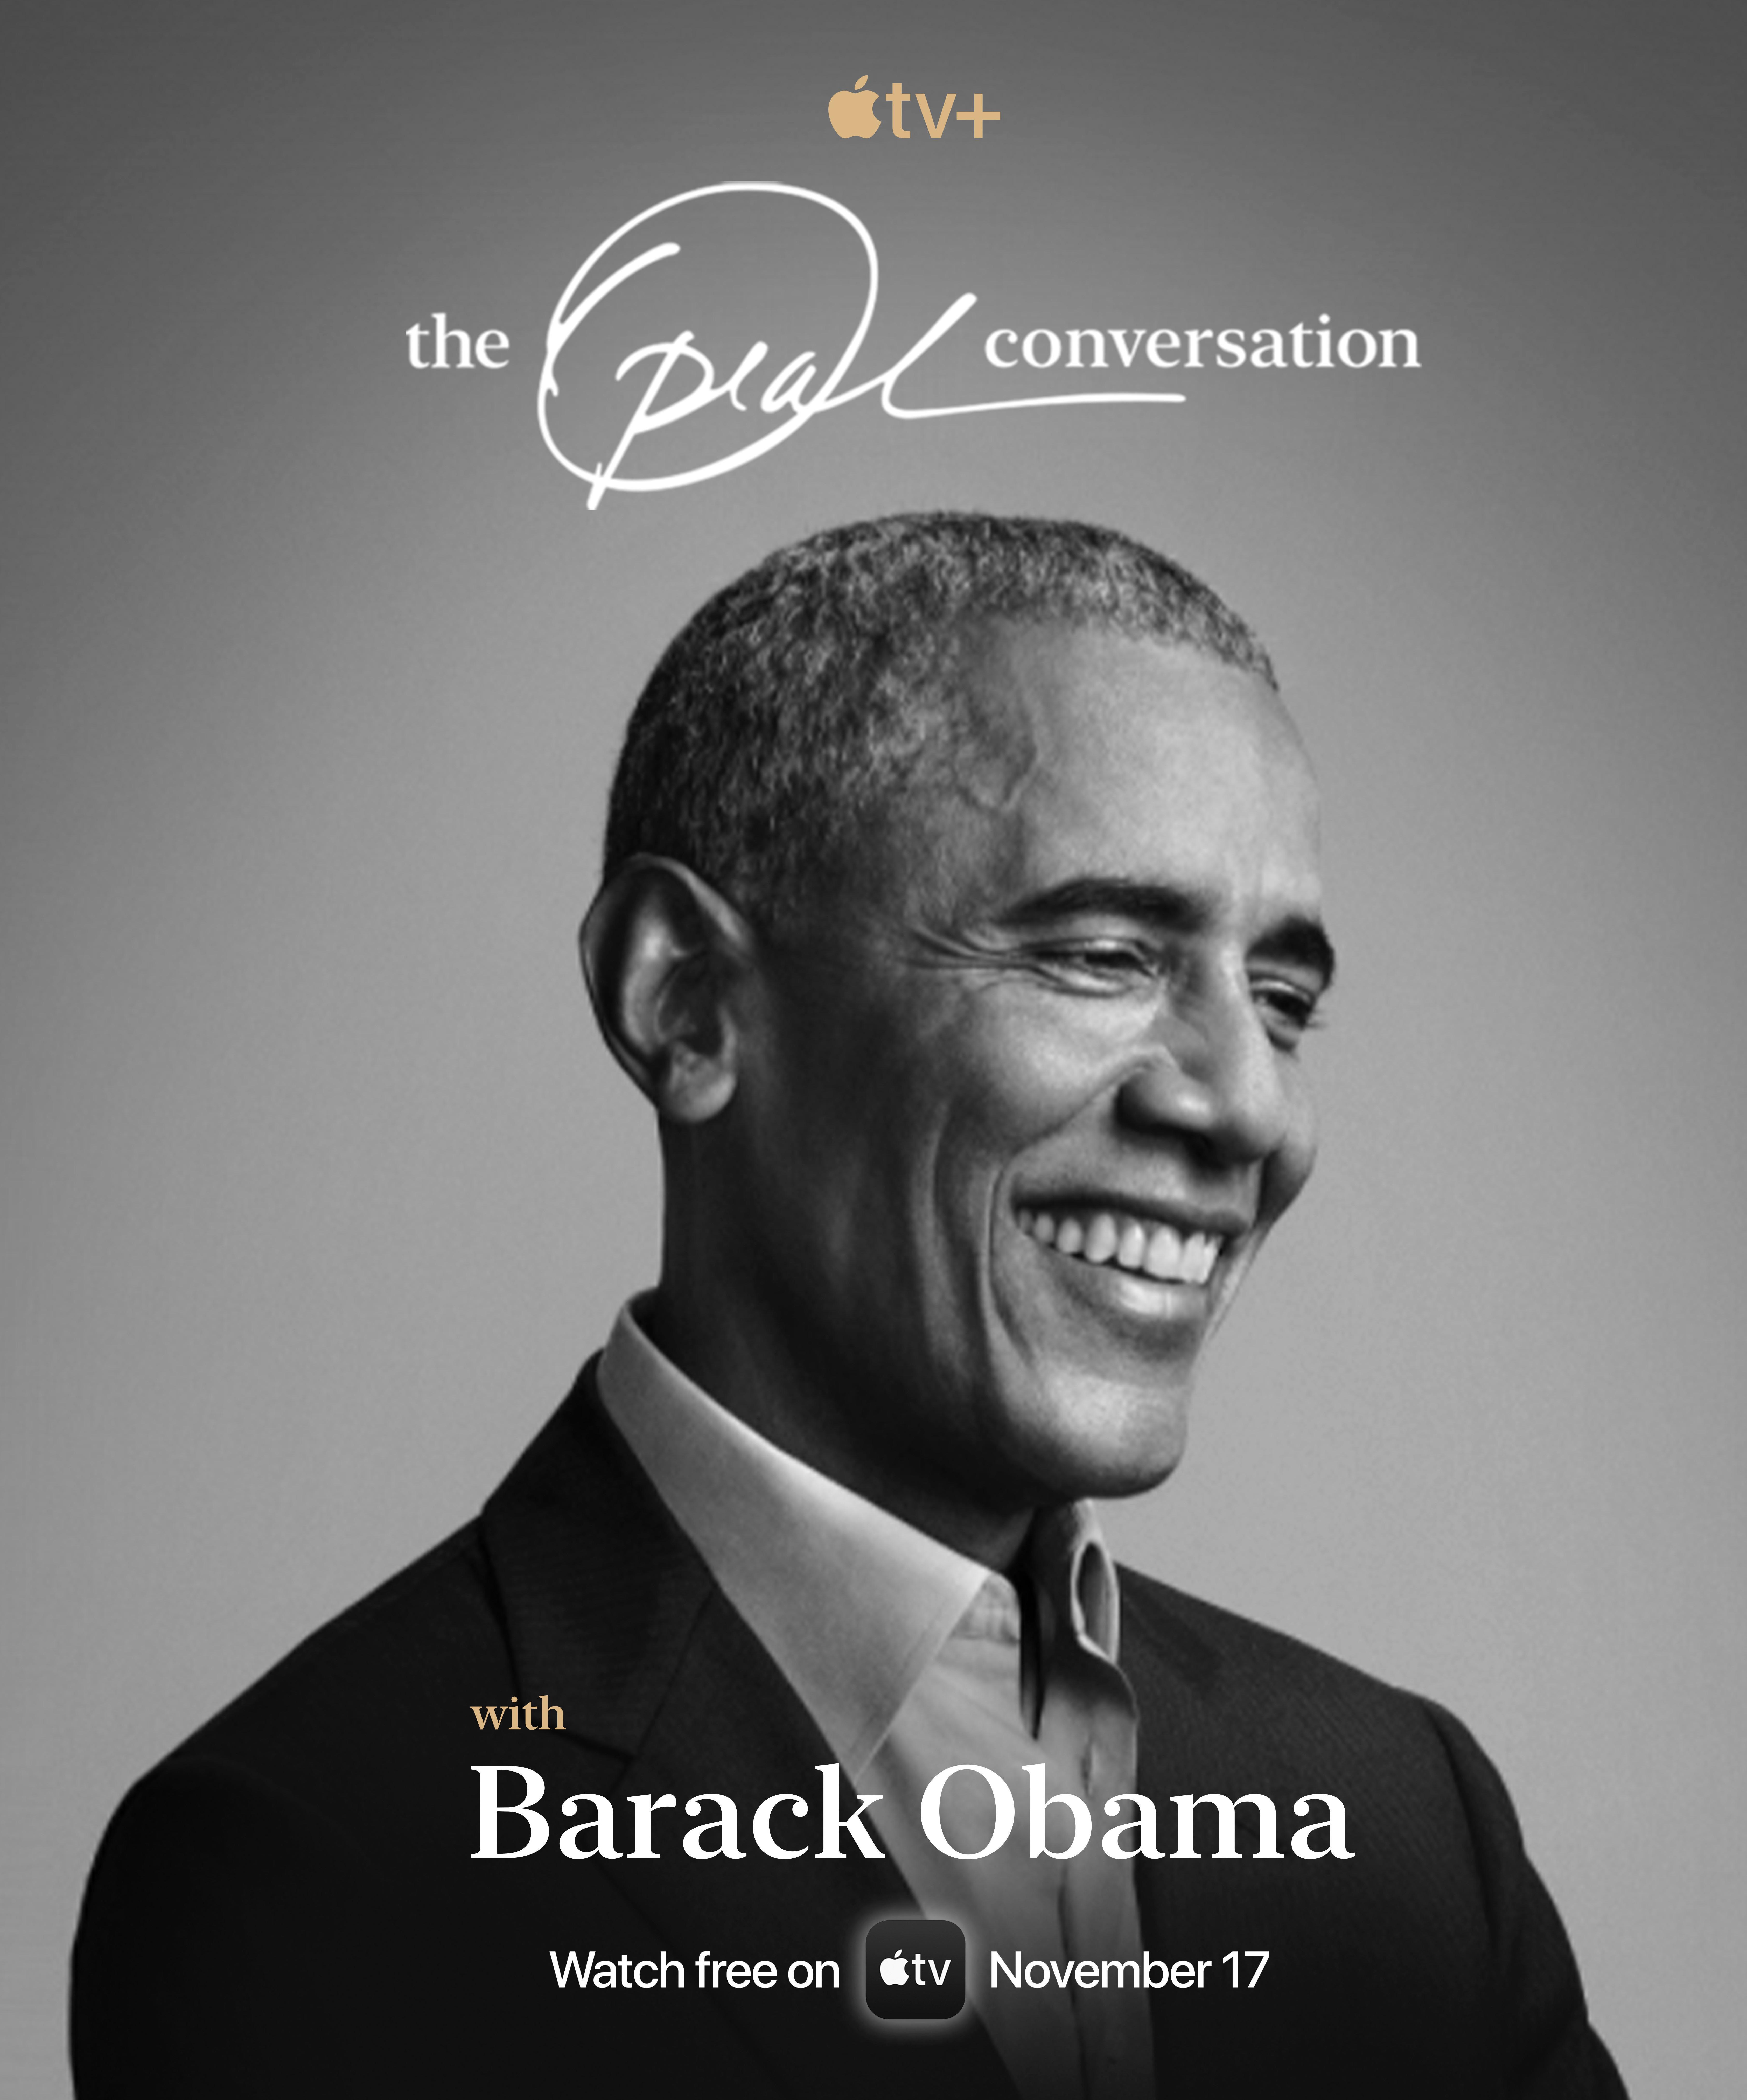 the oprah conversation 01